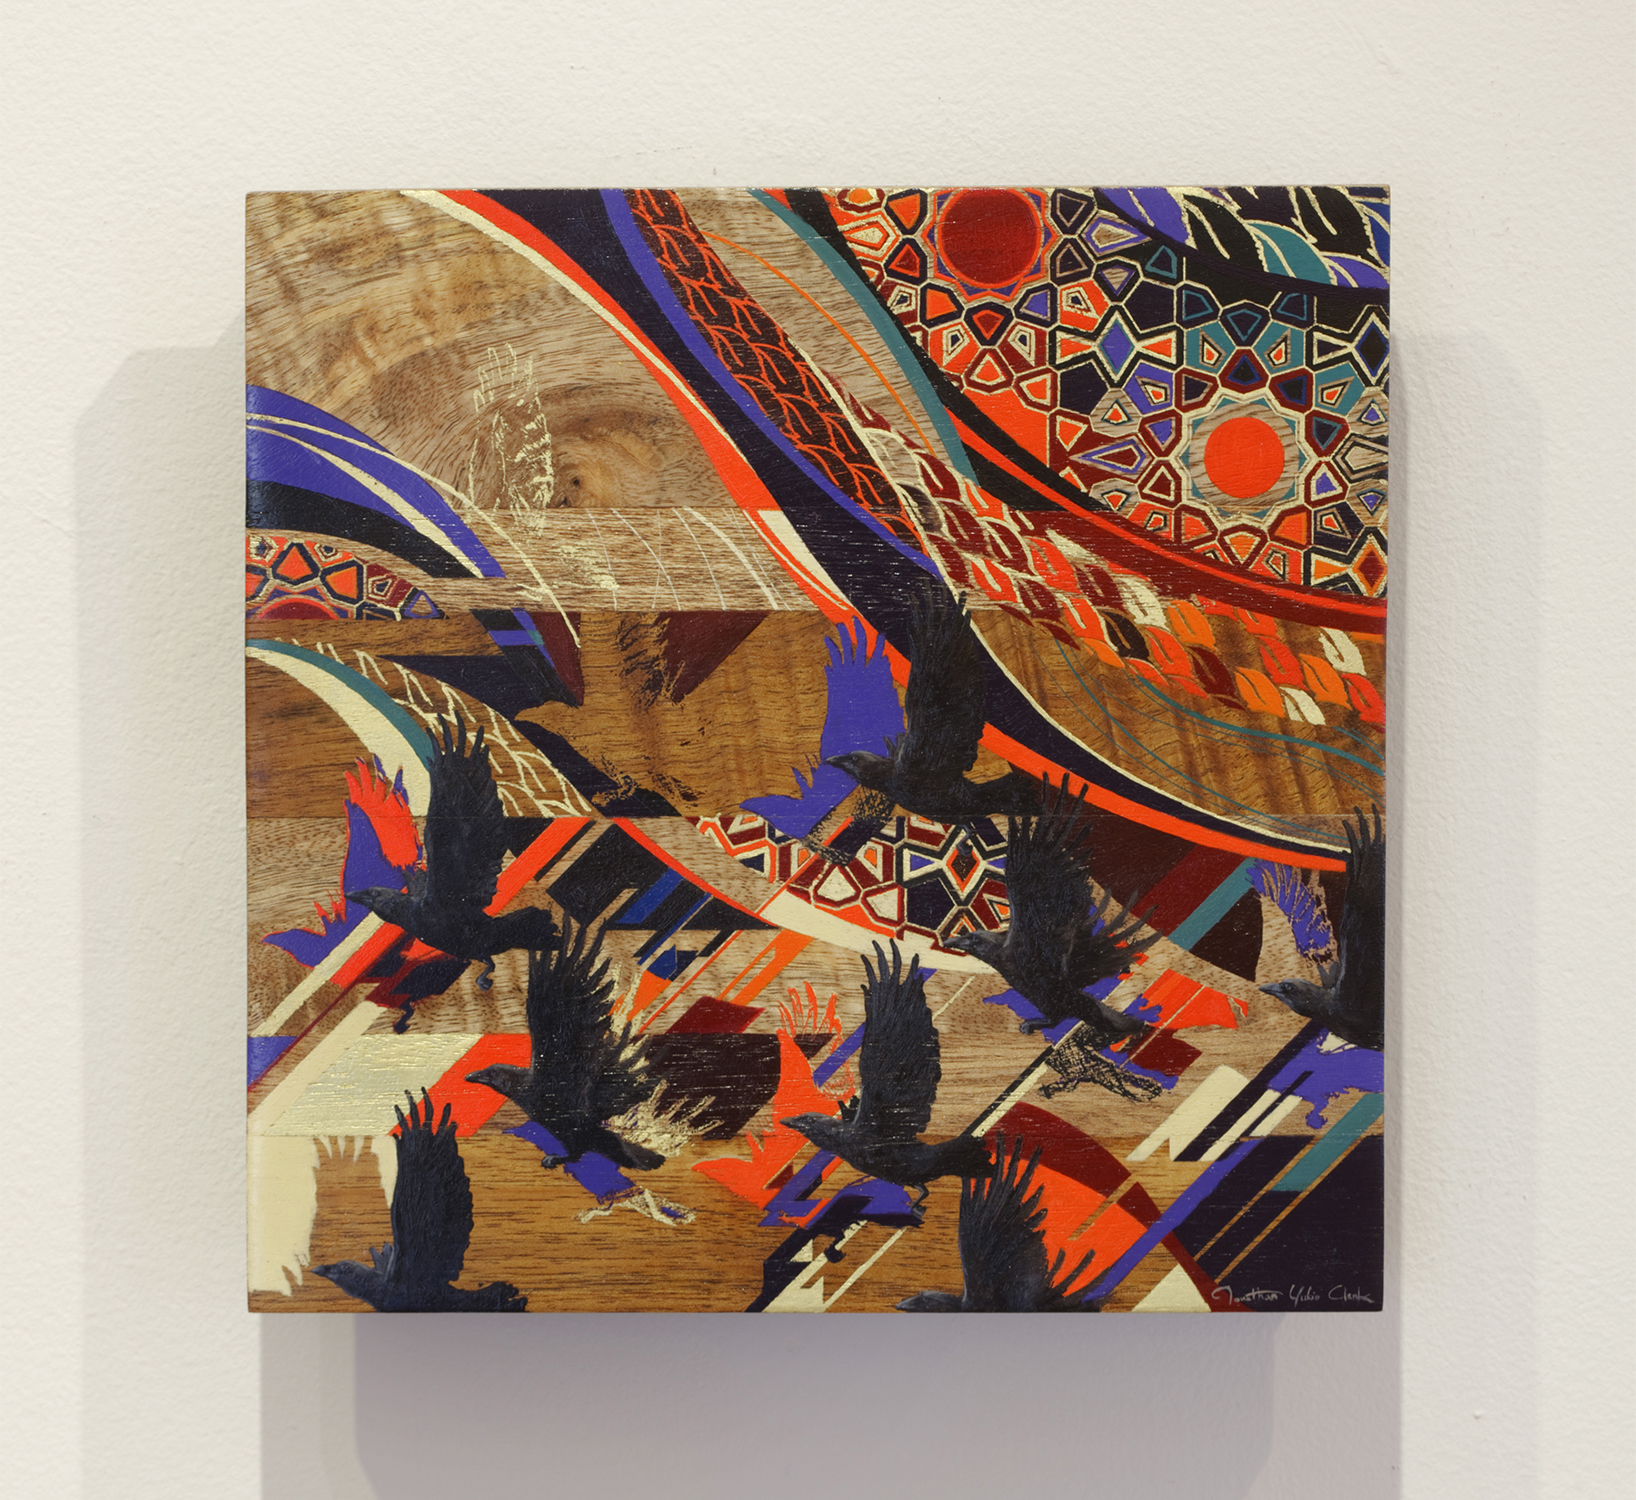 Rise   oil, silkscreen print, gold leaf on hardwood  2013  11 x 11 in